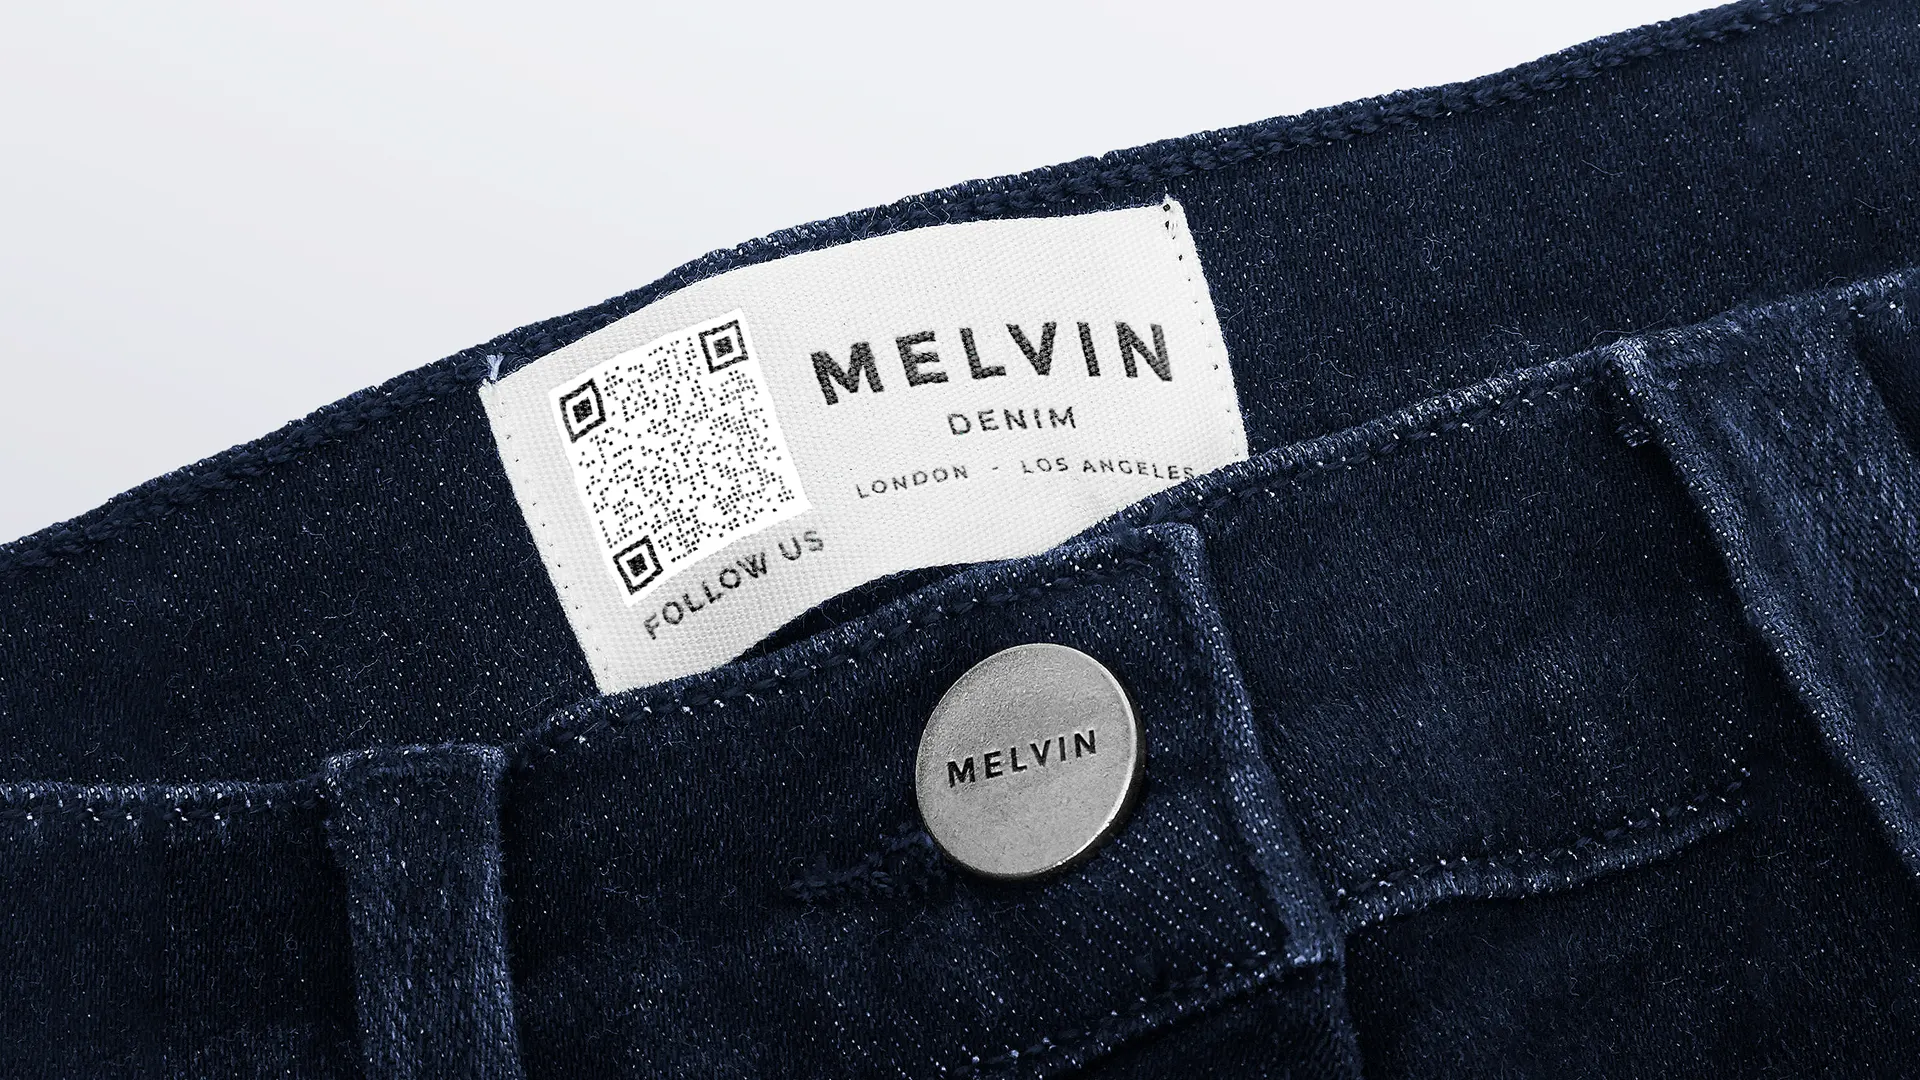 qr codes on clothing for social media